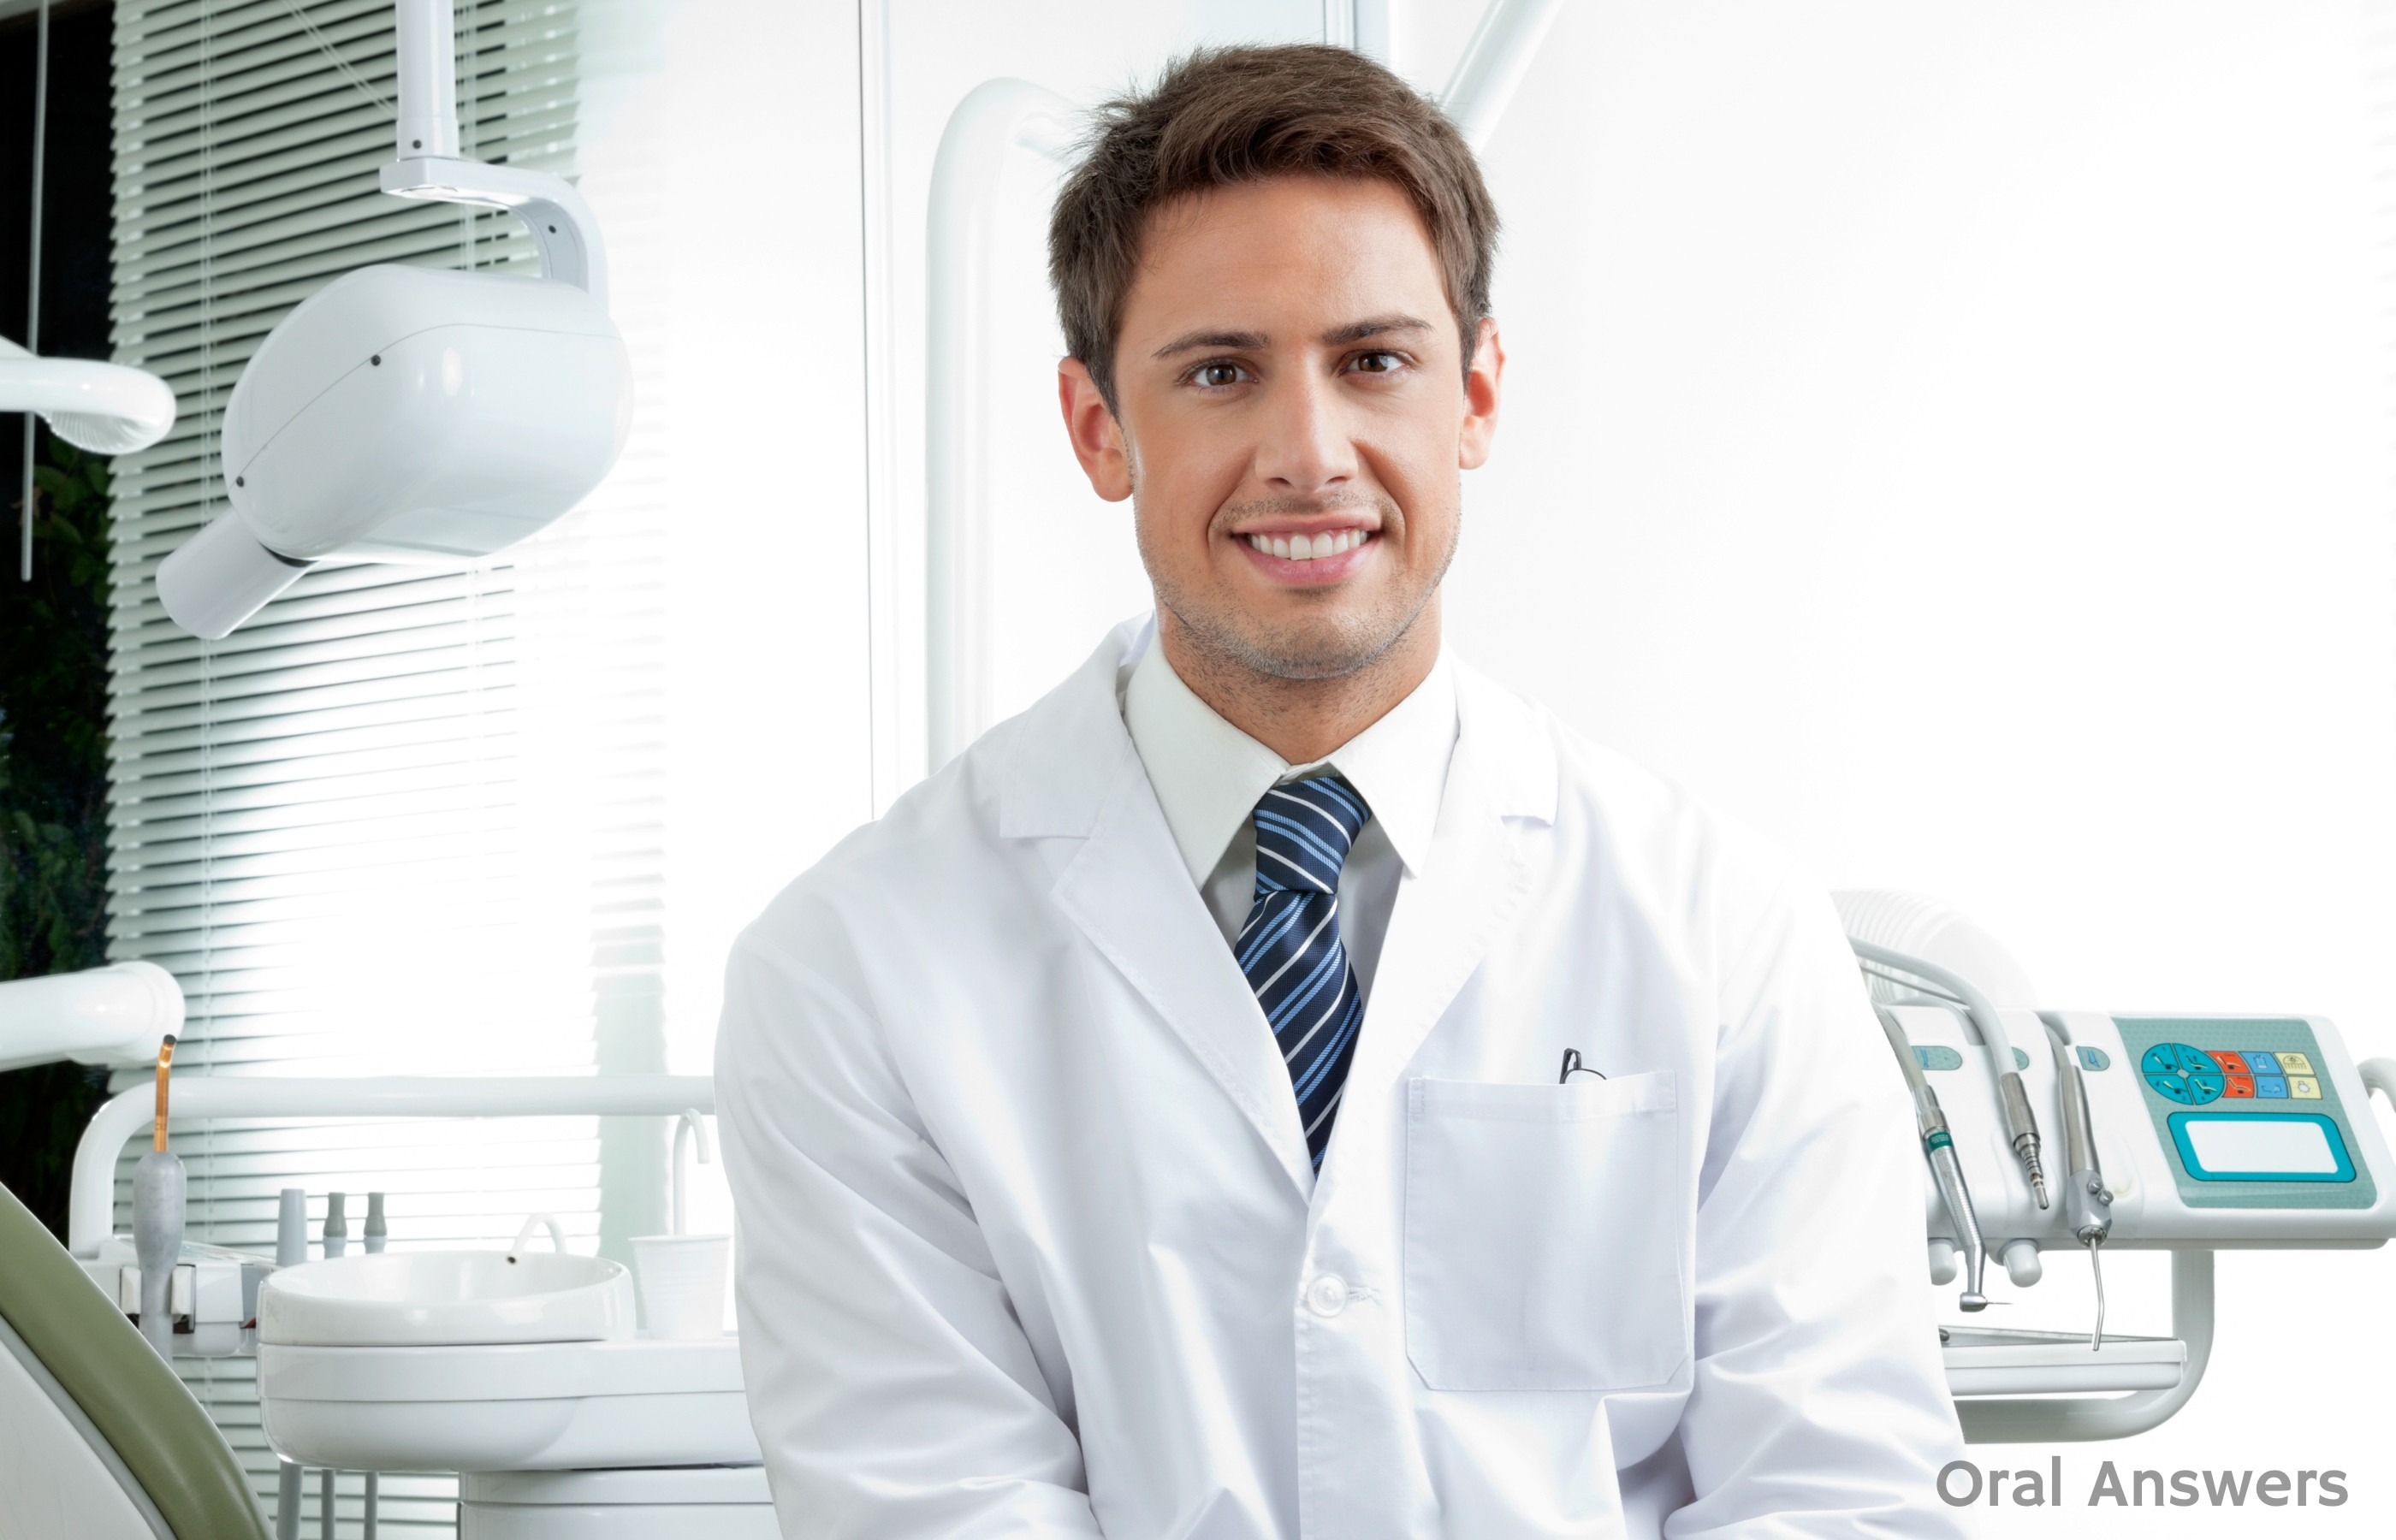 Dentist License Verification: Find Public Records